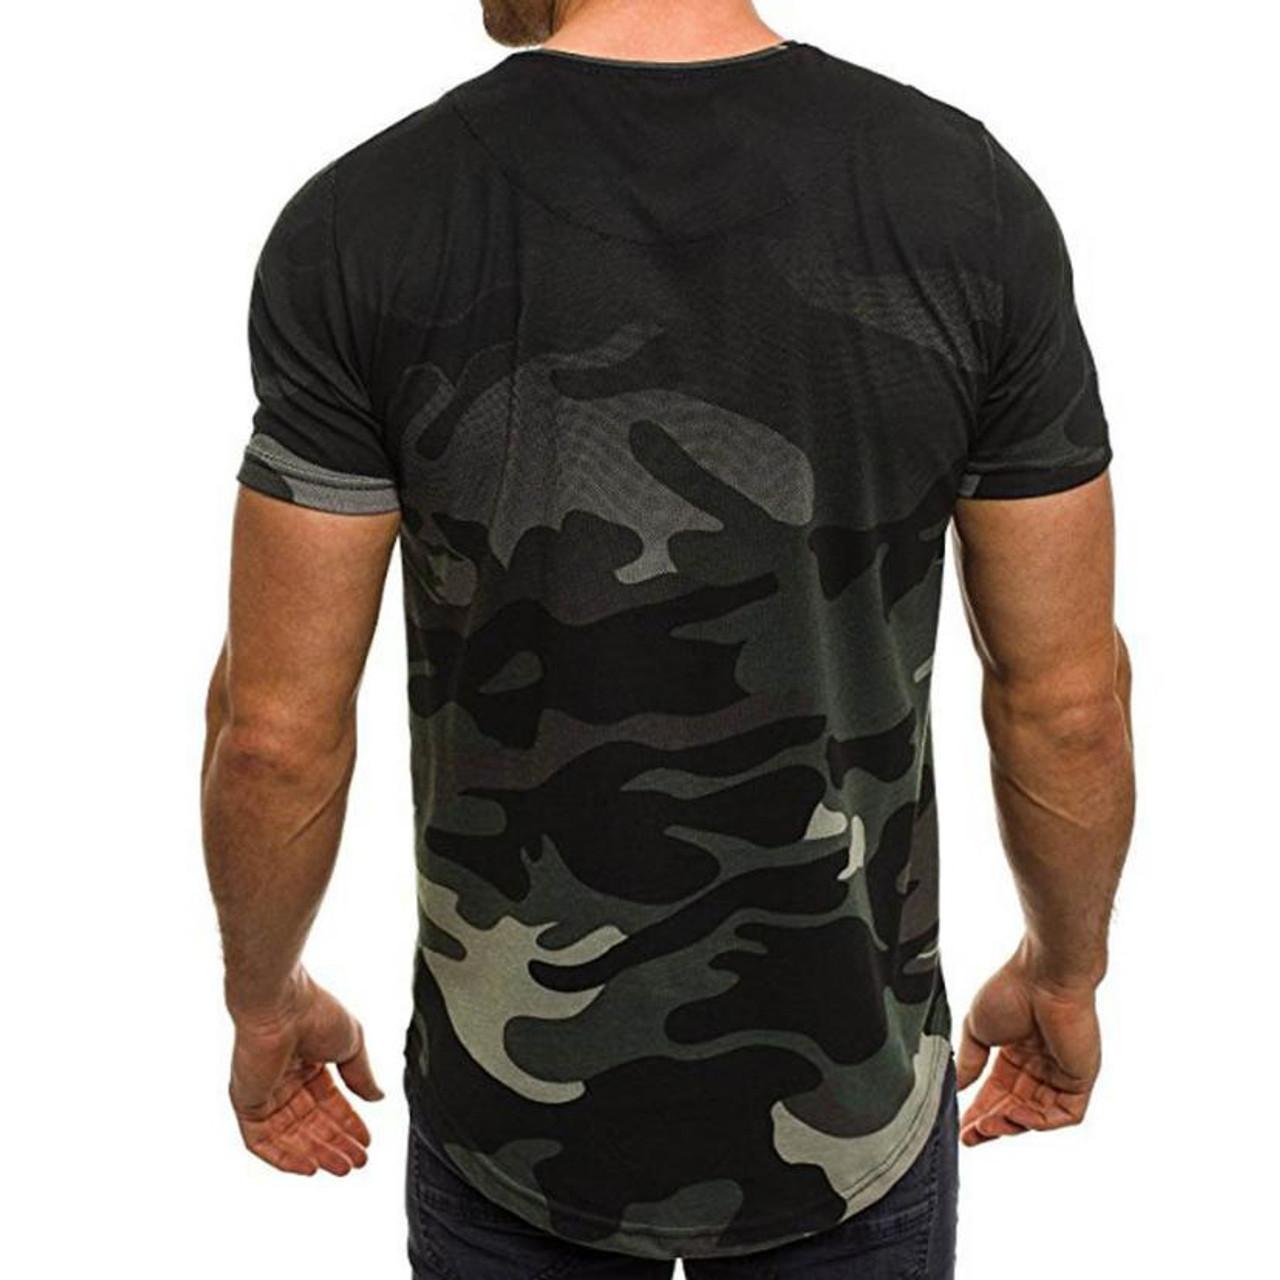 d0bf0222b319 ... New Design Fashion Men s T-Shirt 2018 Summer Short Sleeve Camouflage T  Shirt Men Brand ...